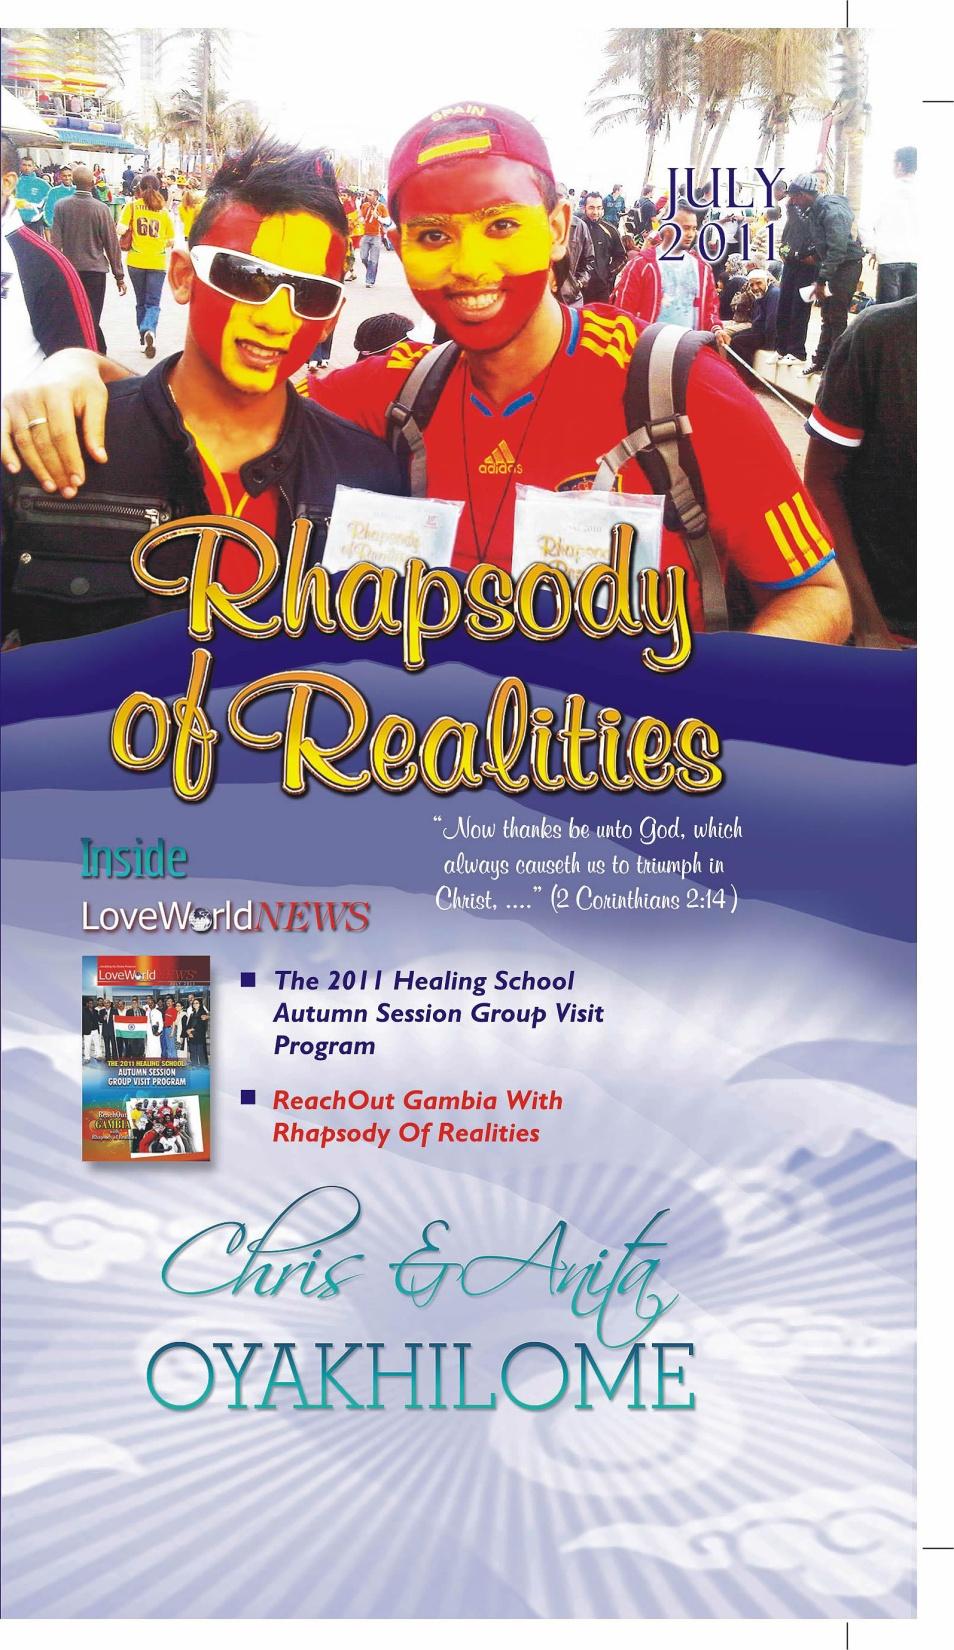 Pastor Chris and Anita Oyakhilome - Rhapsody of Realities July 2011 Edition